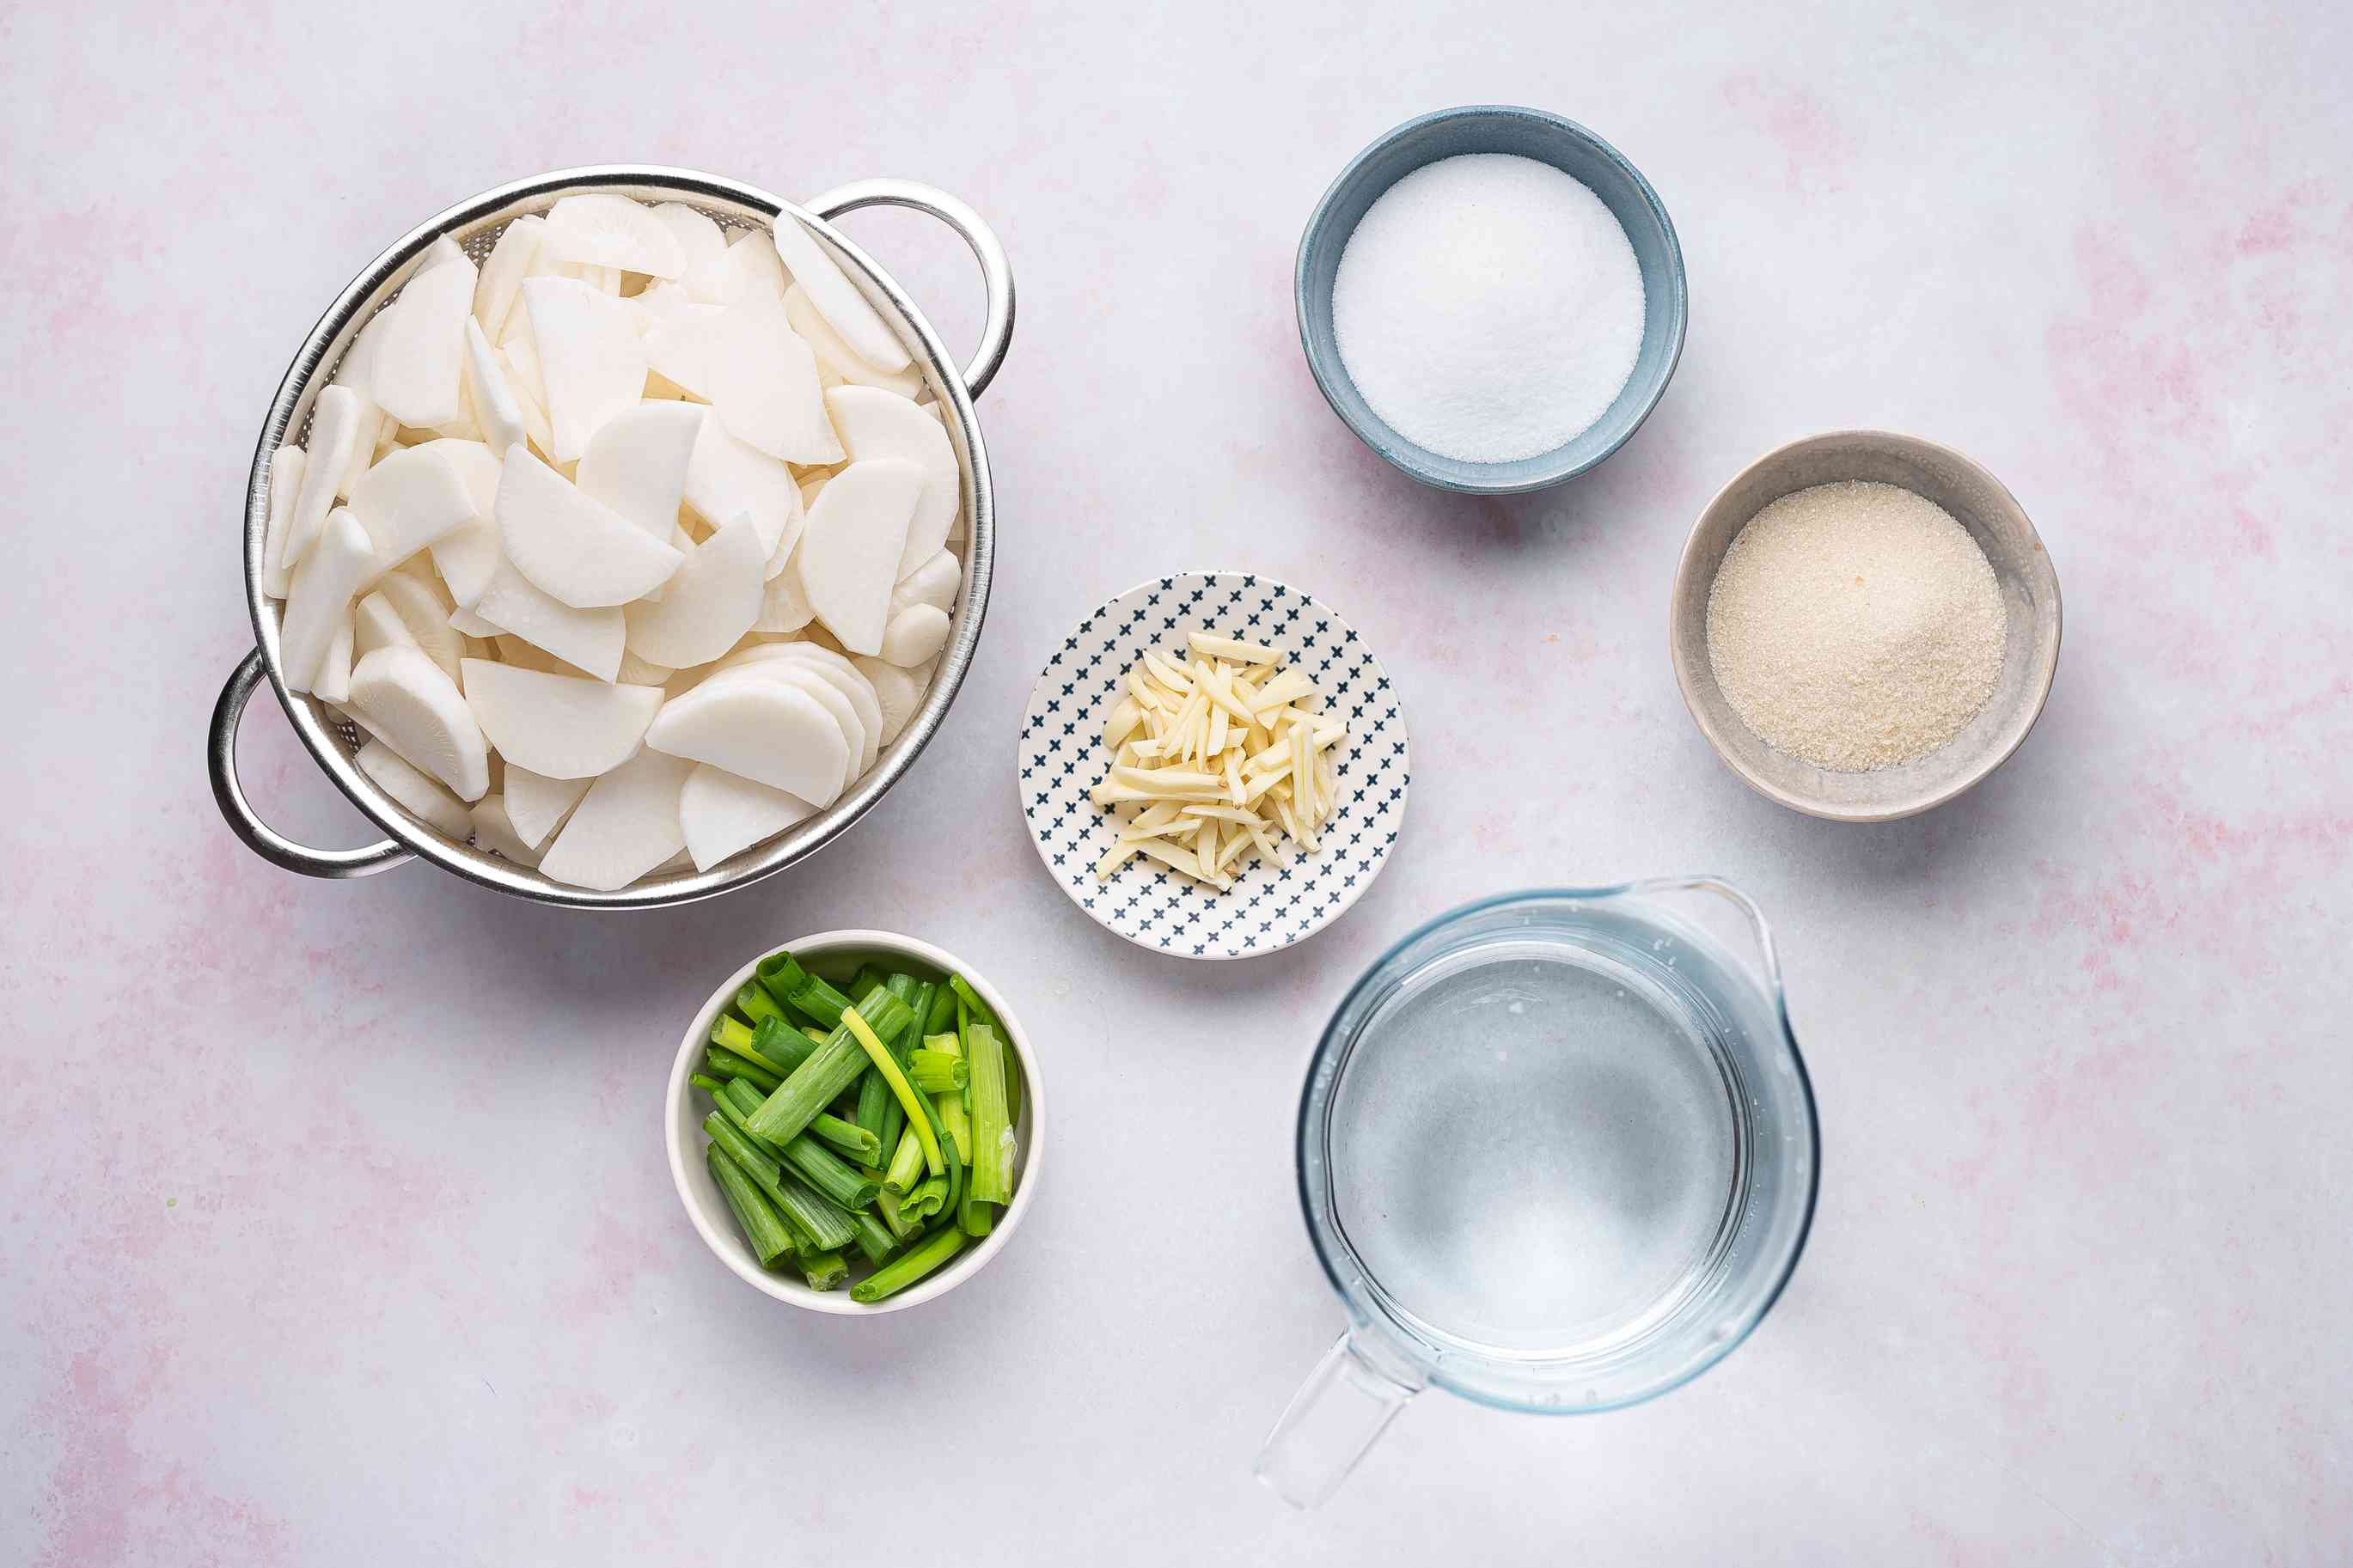 Korean White Radish Kimchi (Dongchimi) ingredients